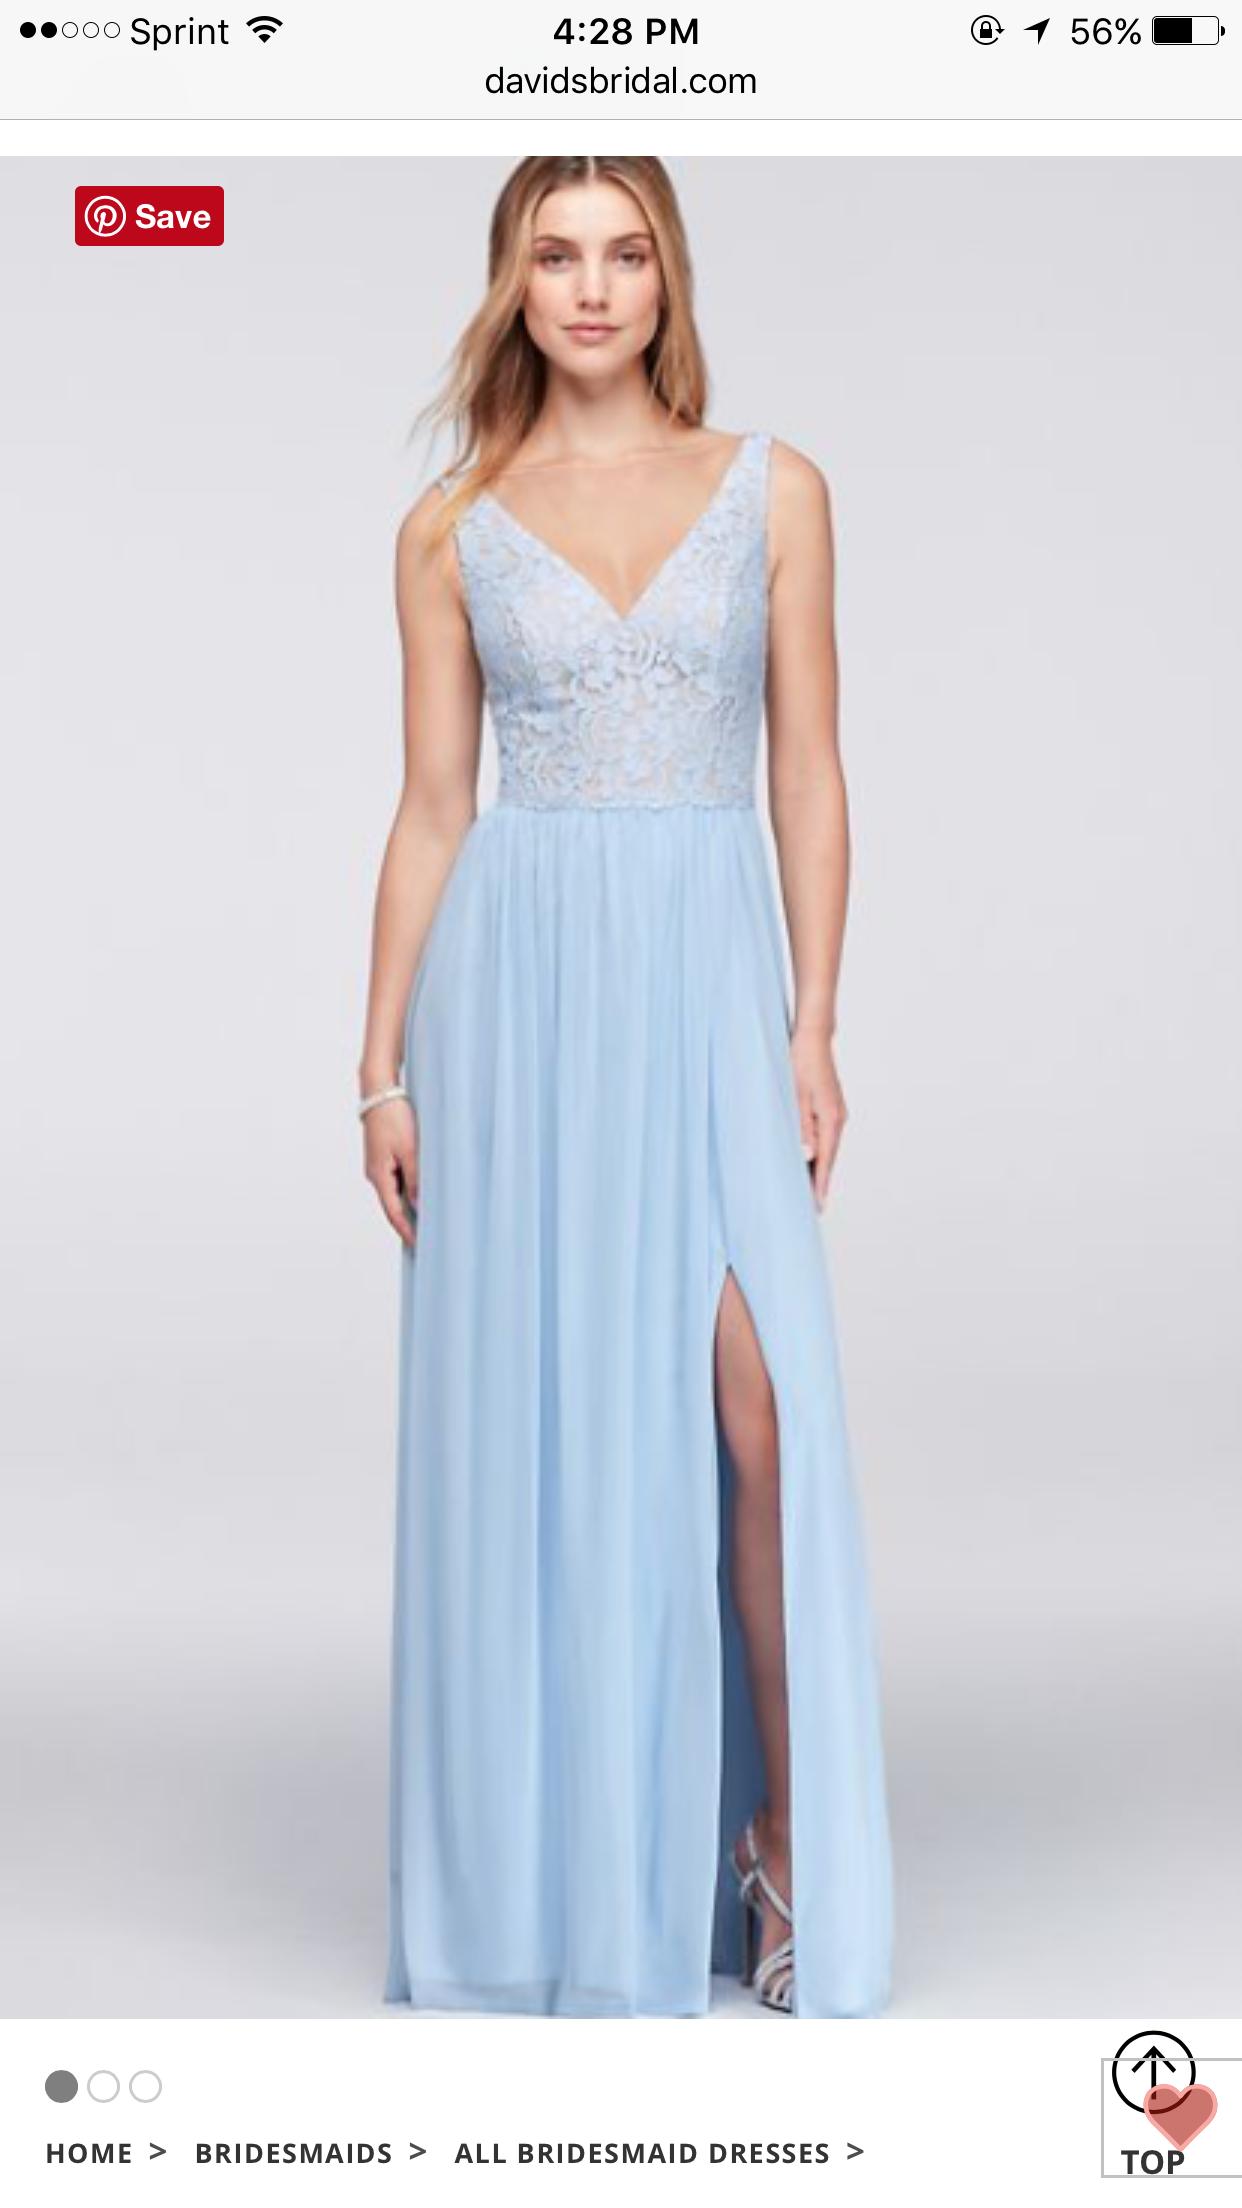 d4037d0a402 Long Satin Tank Ball Gown Bridesmaid Dress Style F15741 - Data ...